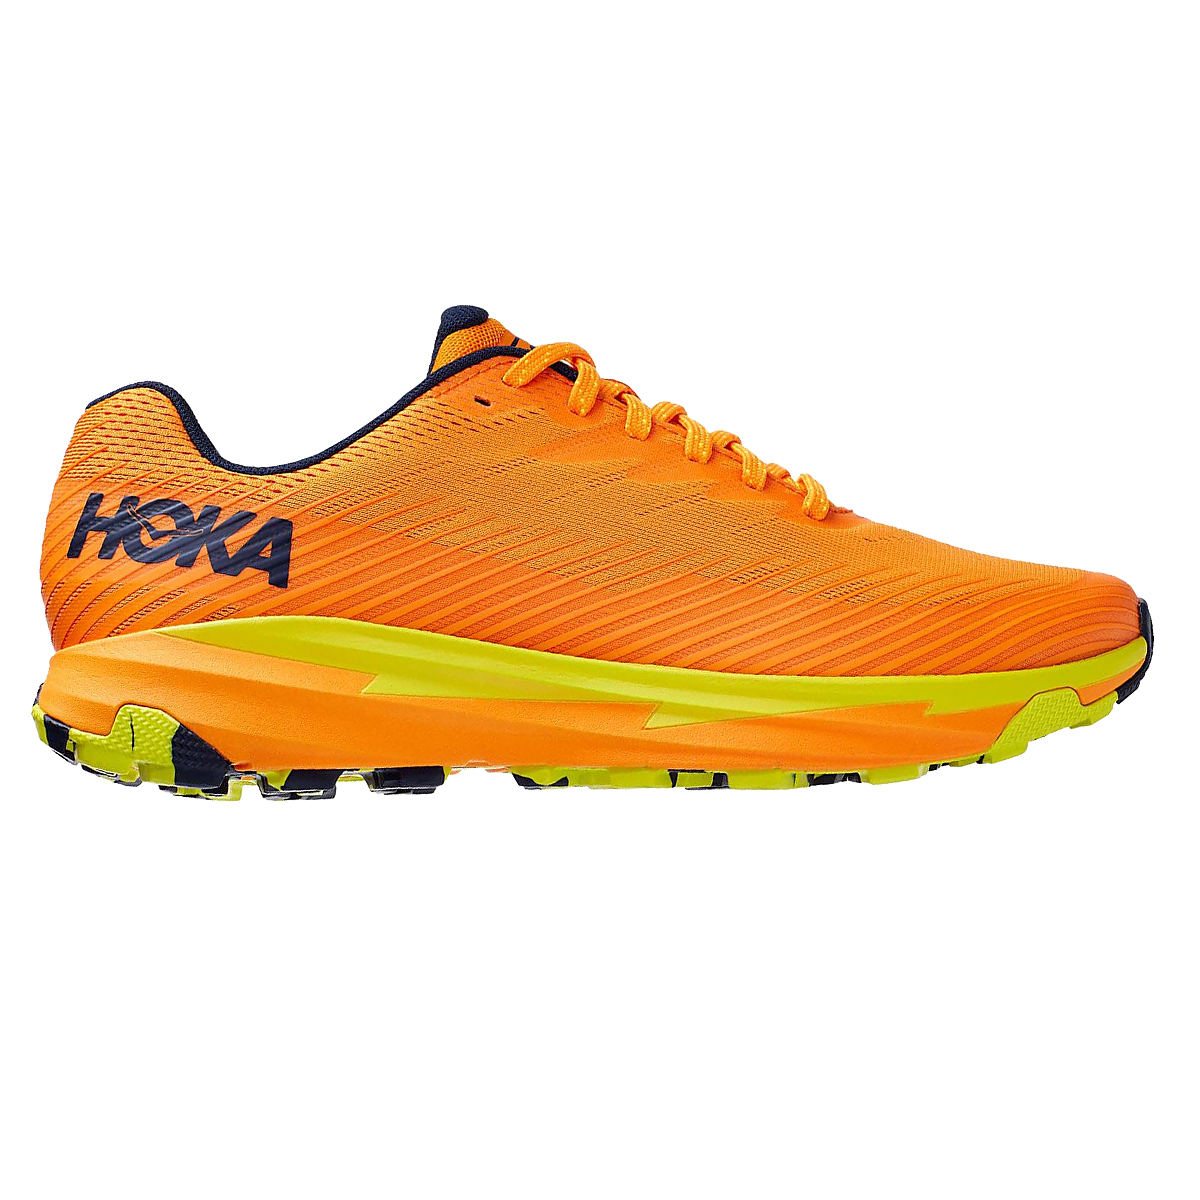 Men's Hoka Torrent 2 Running Shoe